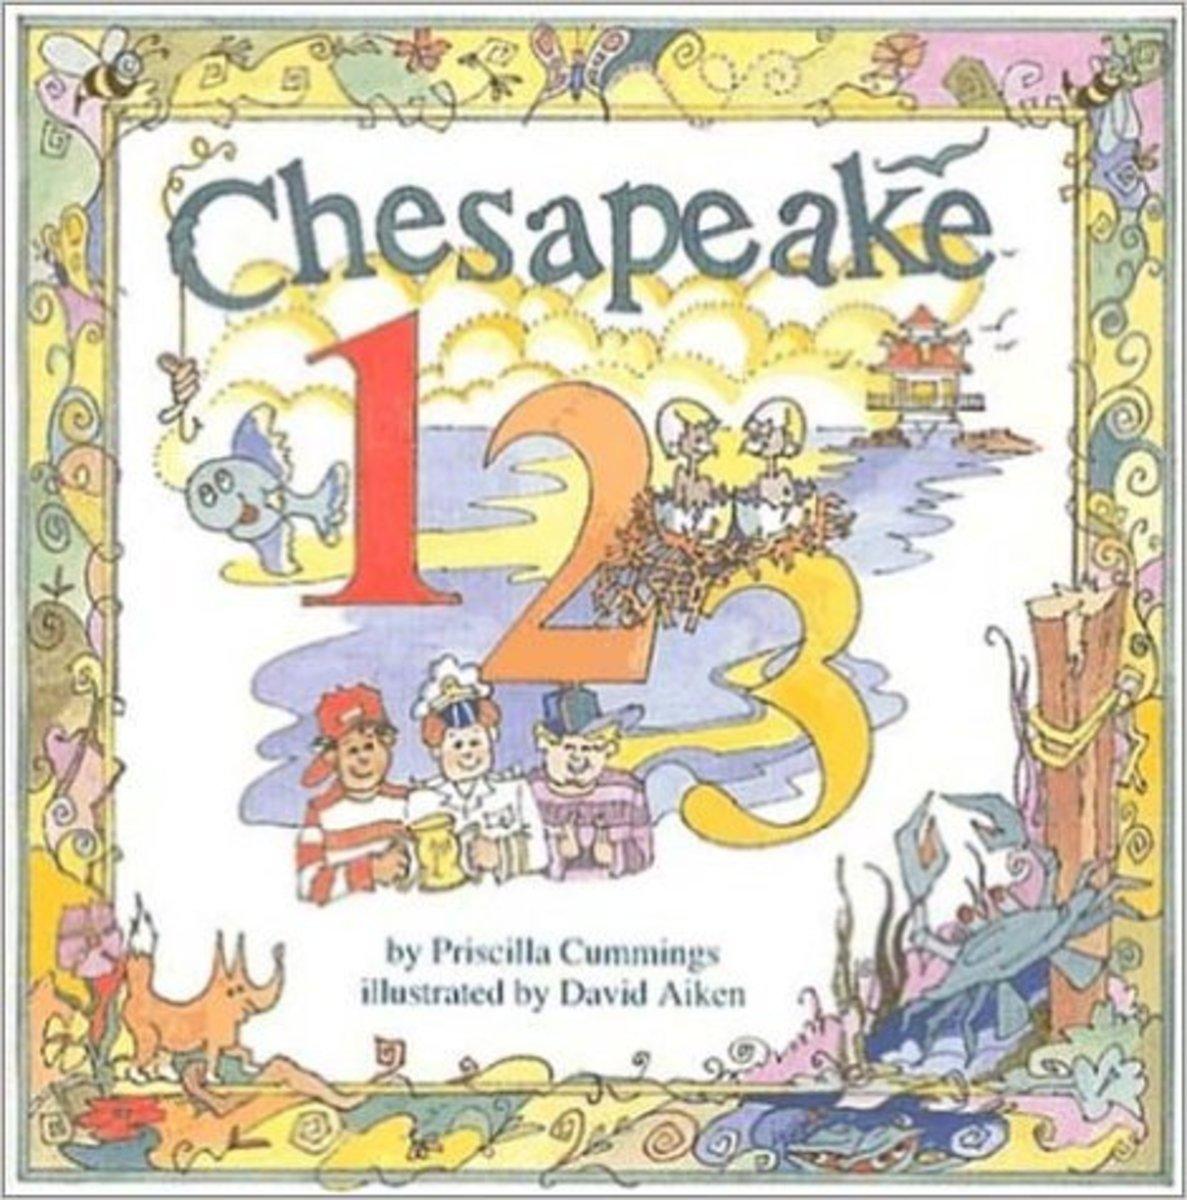 Chesapeake 1-2-3 by Priscilla Cummings